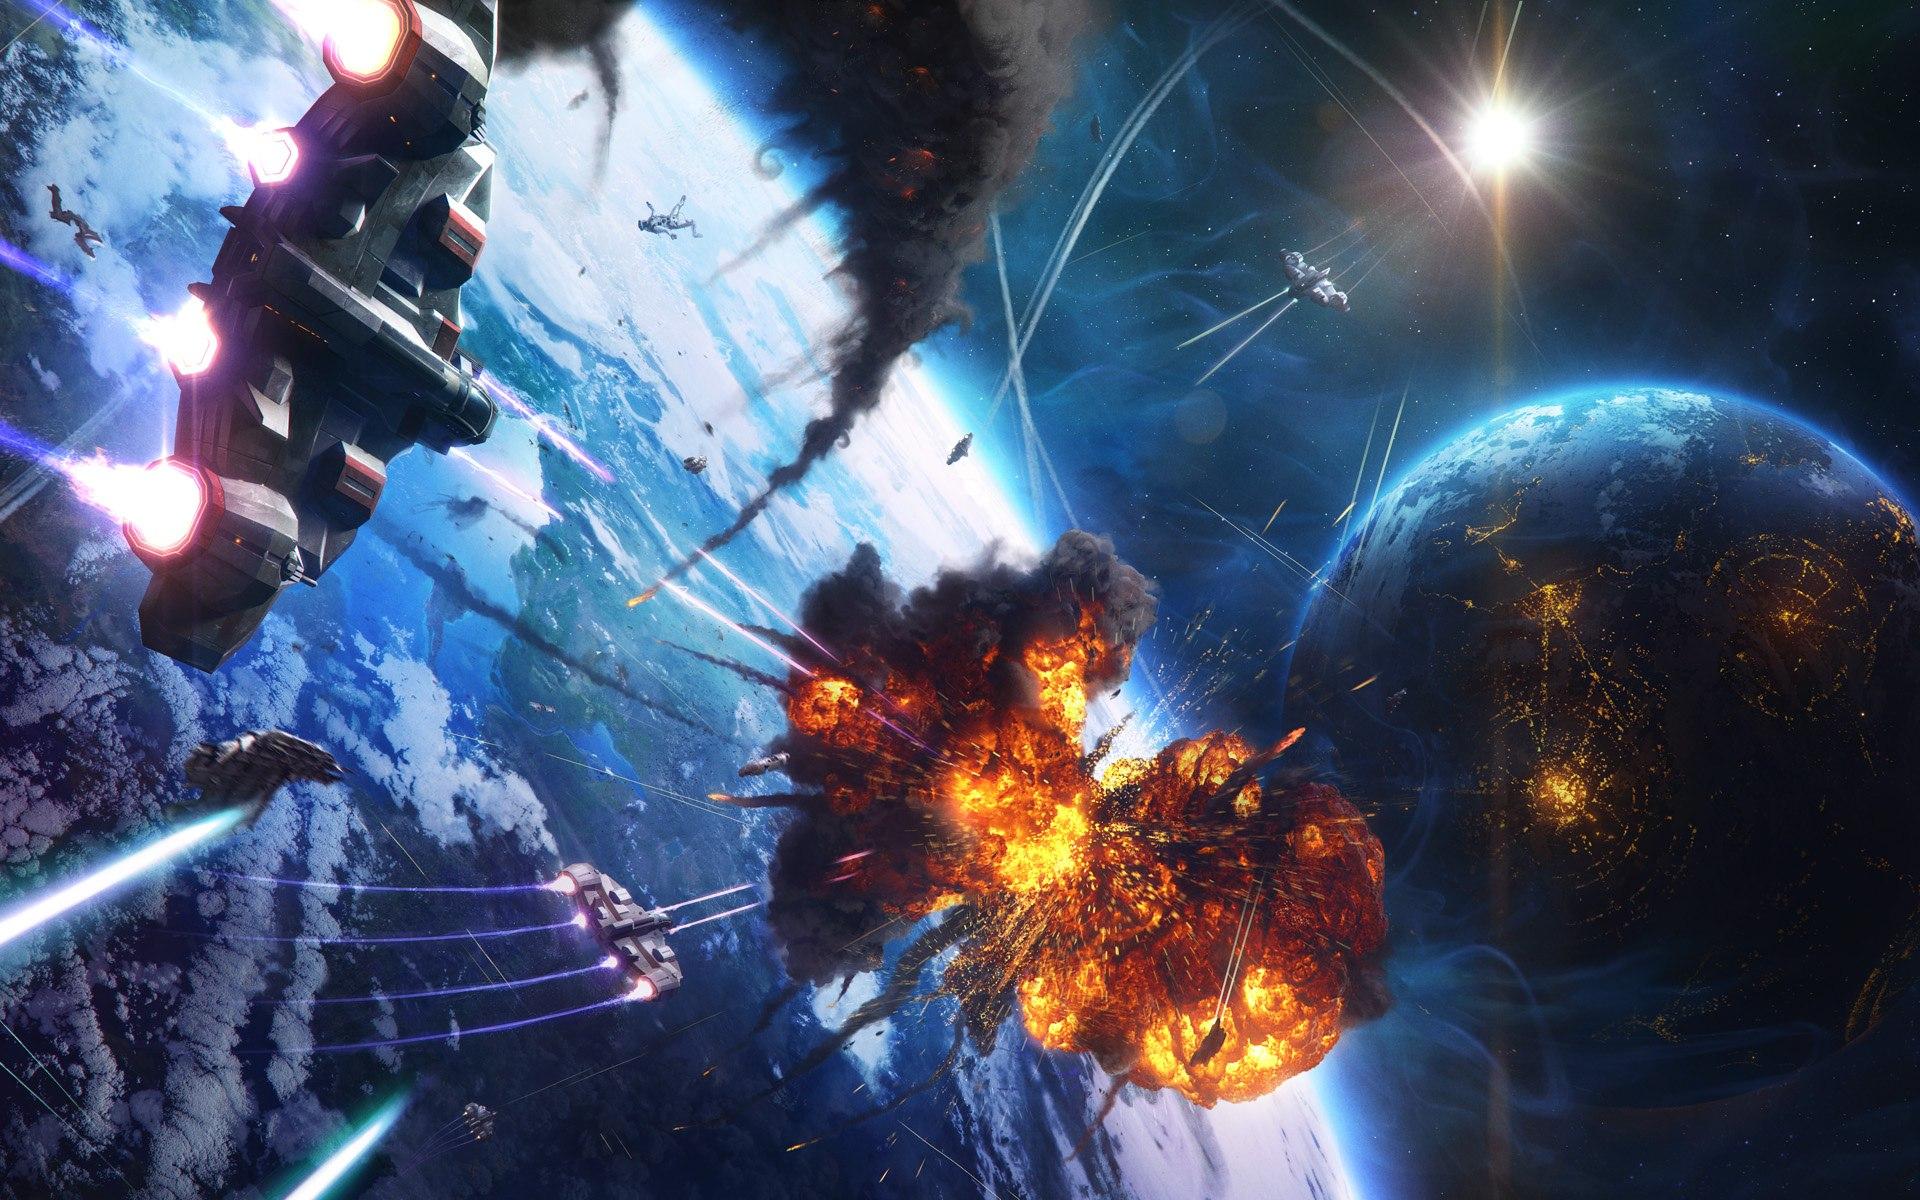 Amazing Sci Fi Space Battle Wallpaper HD 19 High Resolution Wallpaper 1920x1200